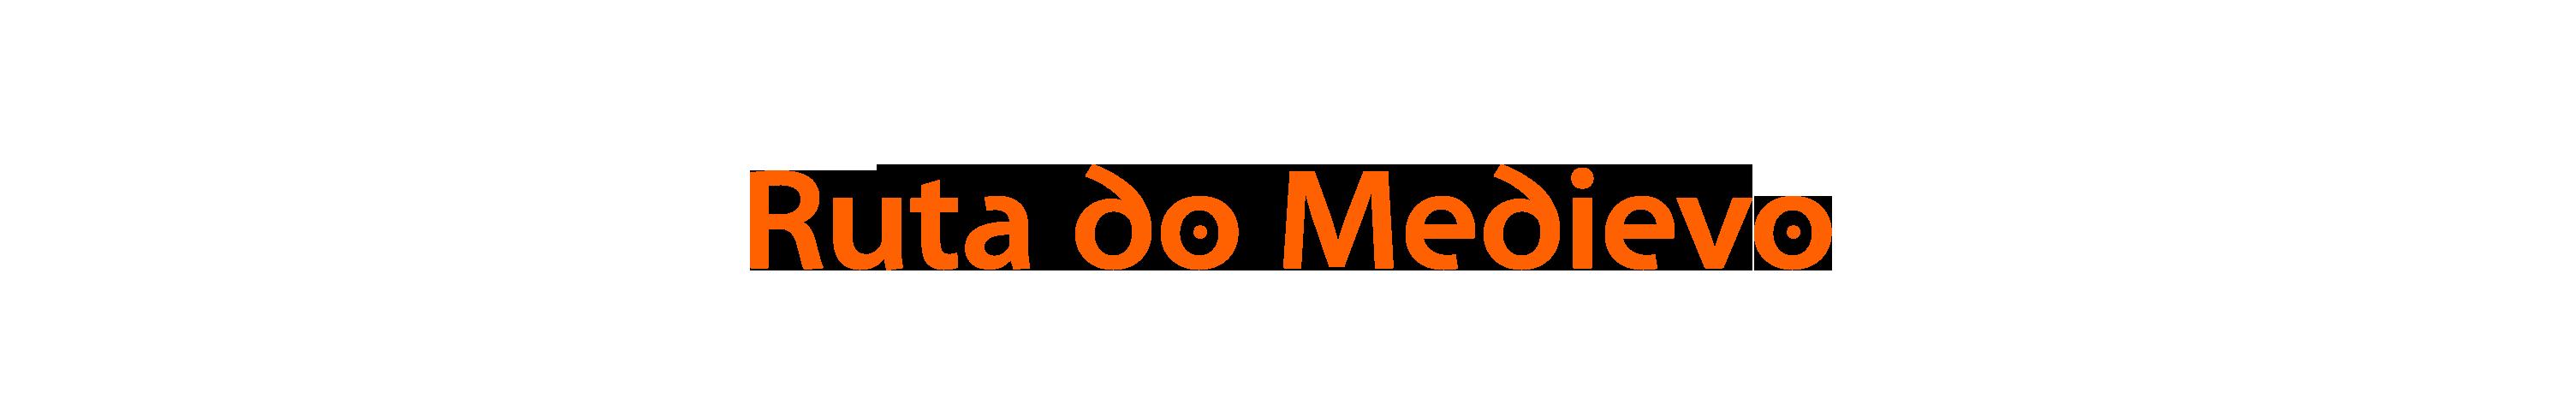 Ruta do Medievo